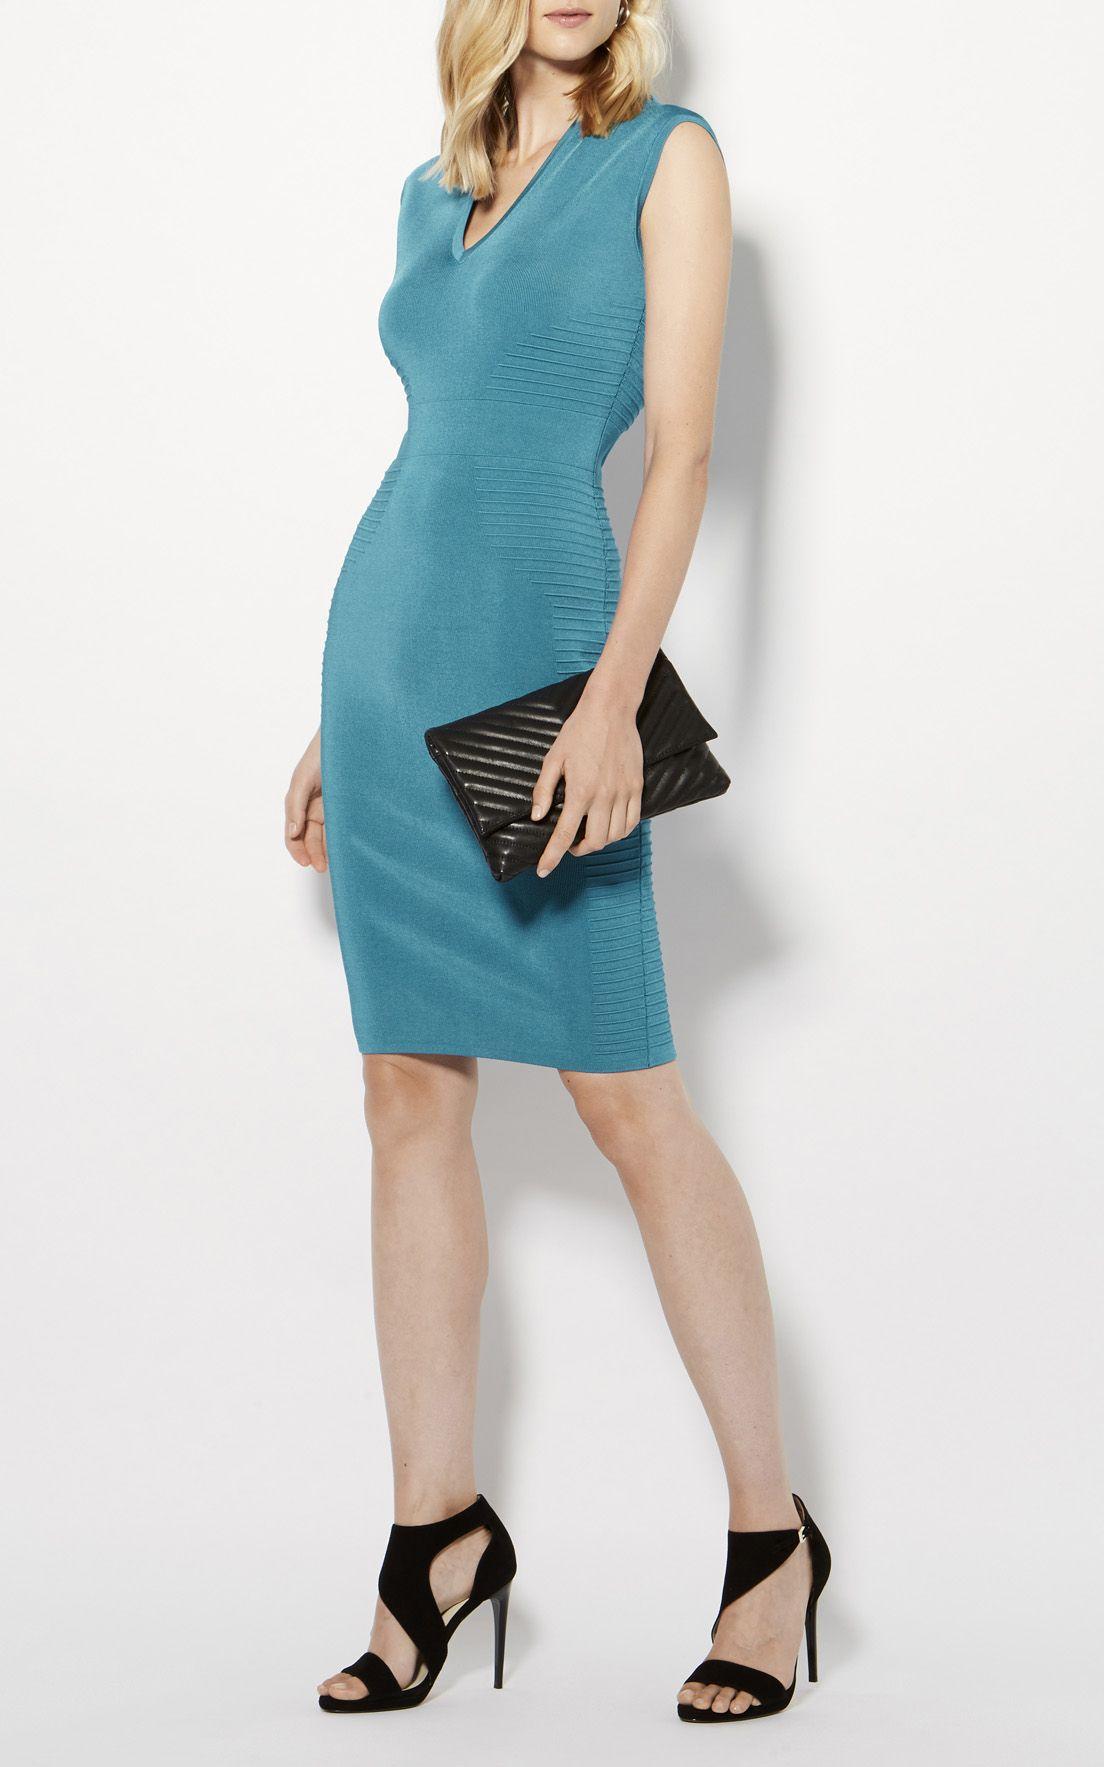 Karen Millen, RIBBED KNIT PENCIL DRESS Aqua | Goth Chic | Pinterest ...